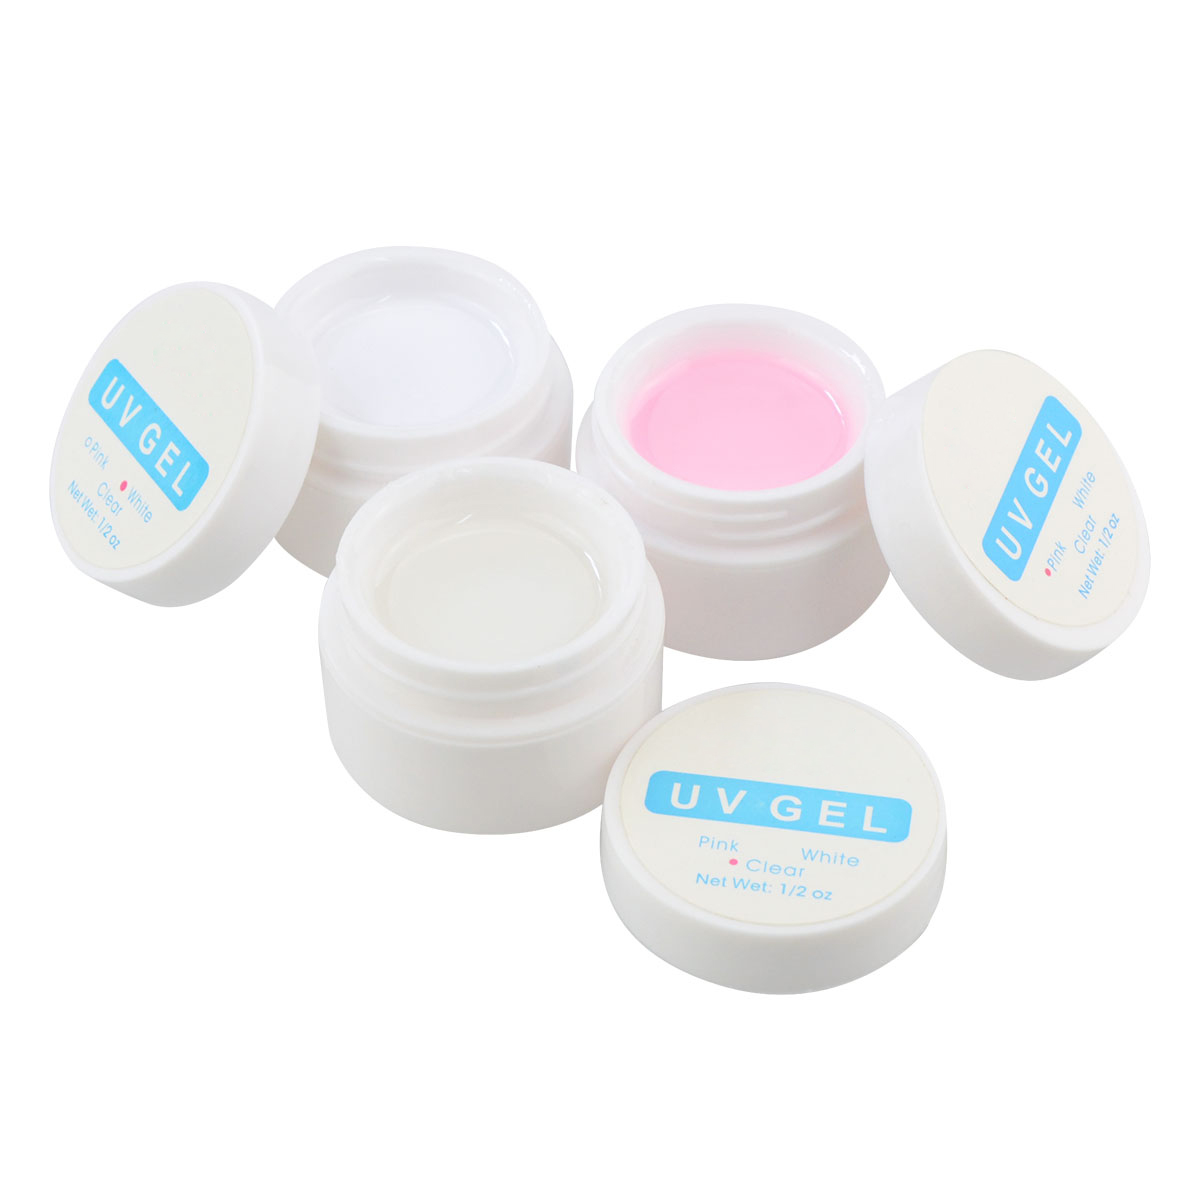 UV Gel Nail Polish Pink White Clear Transparent UV Curing